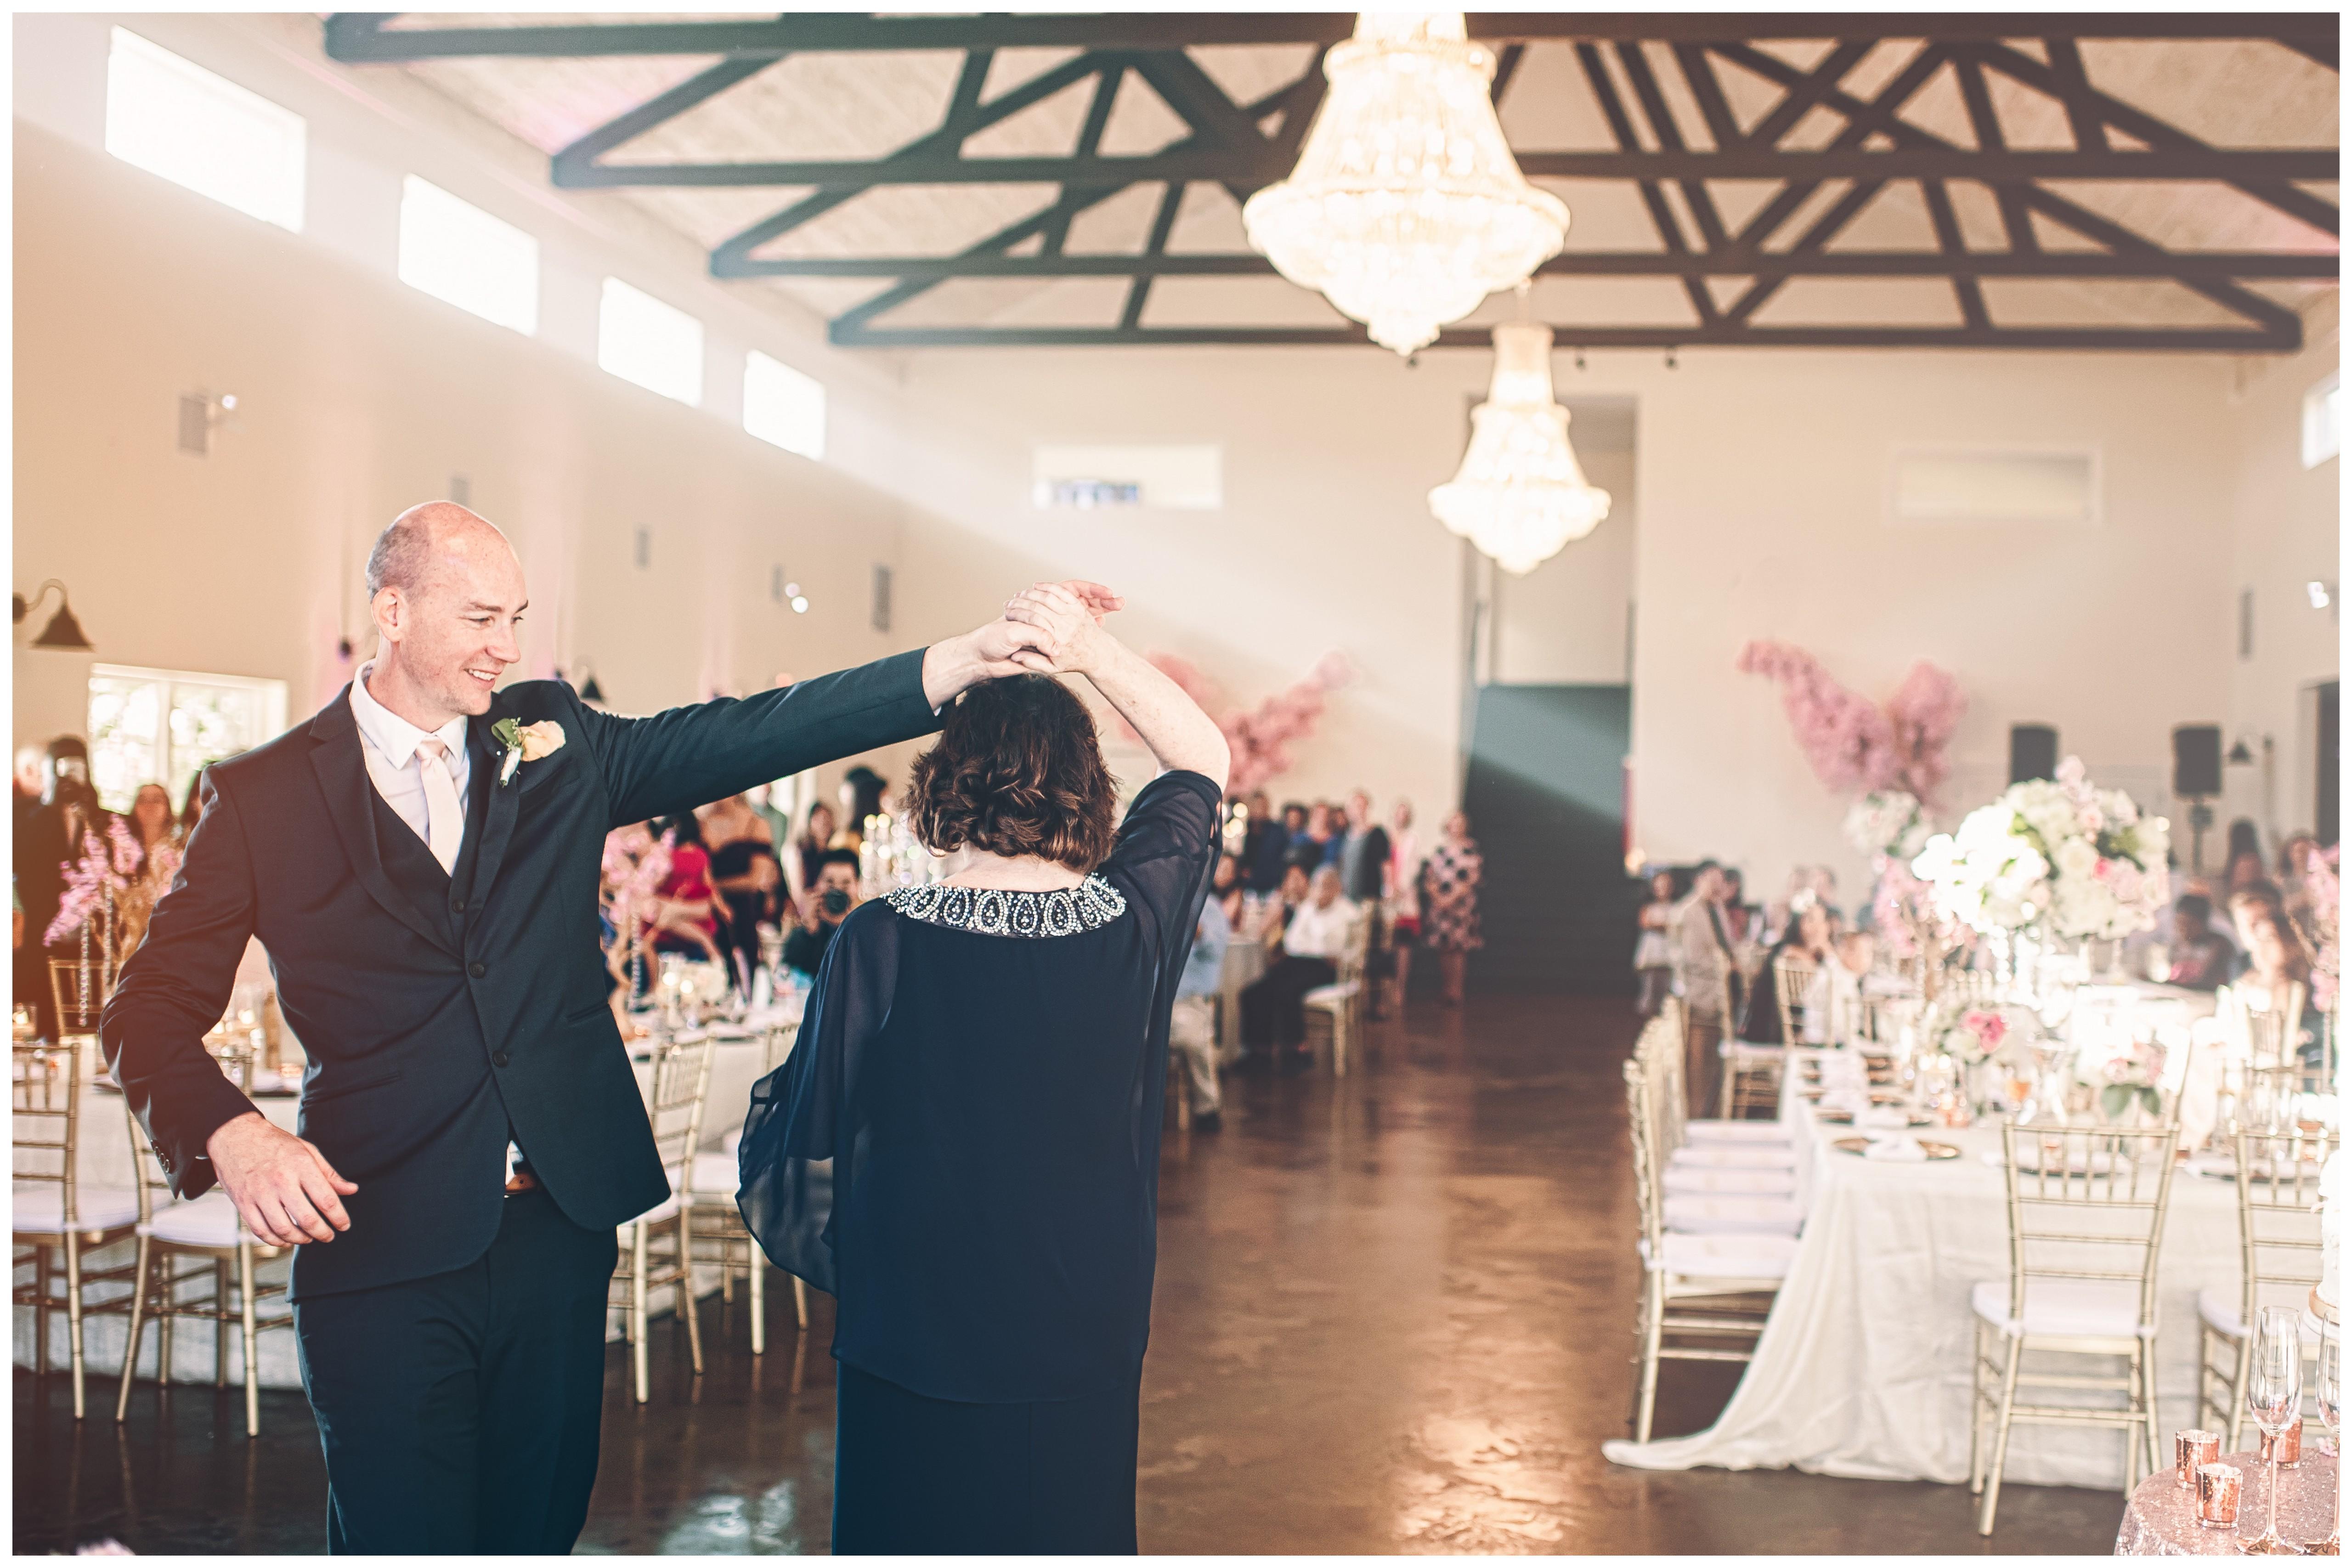 LIVE_FINAL_WEDDING_ANDREW_THERESA5